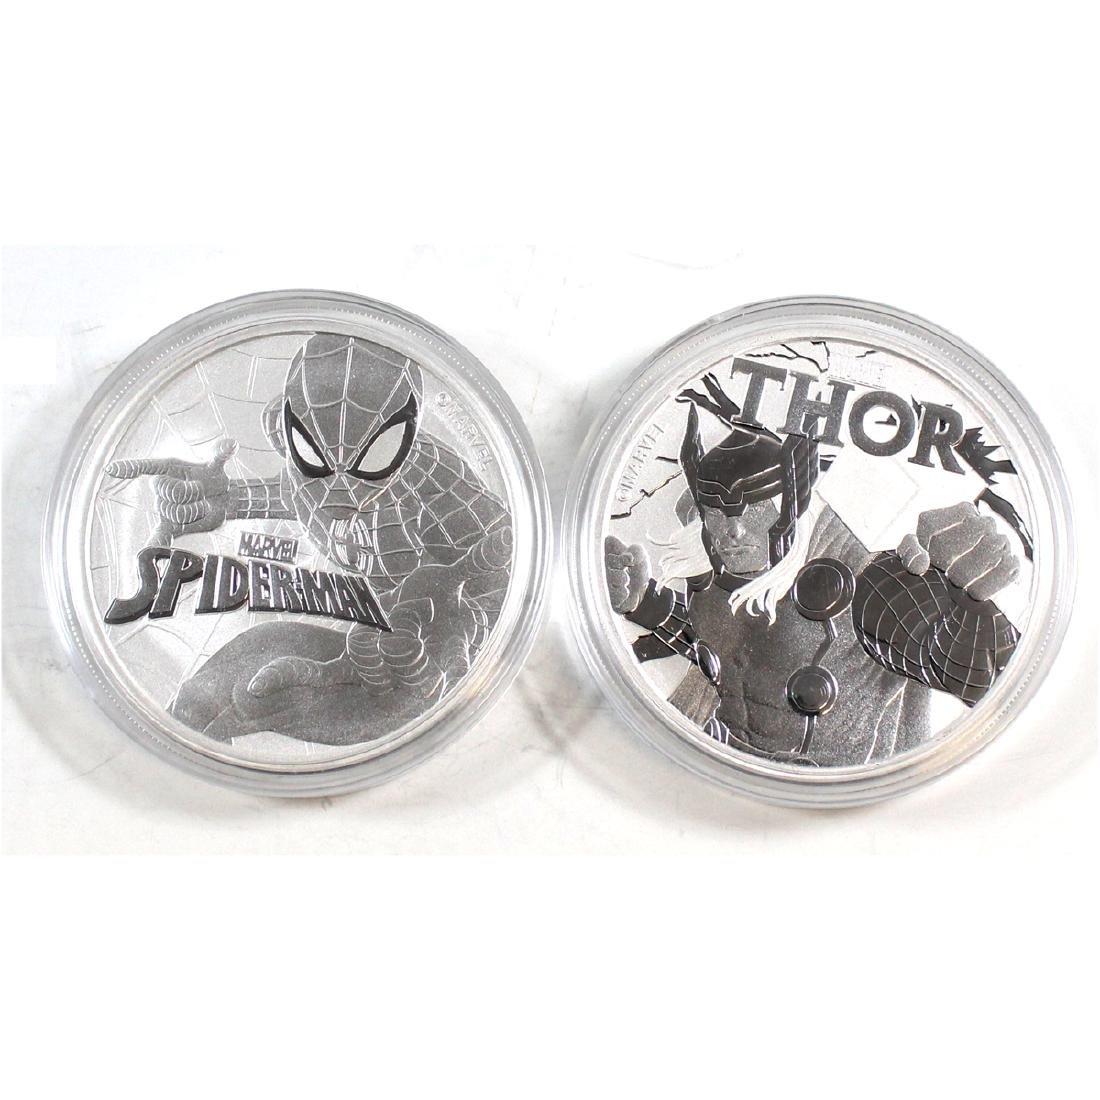 Pair of Tuvalu $1 Marvel Series 1oz. .999 Fine Silver